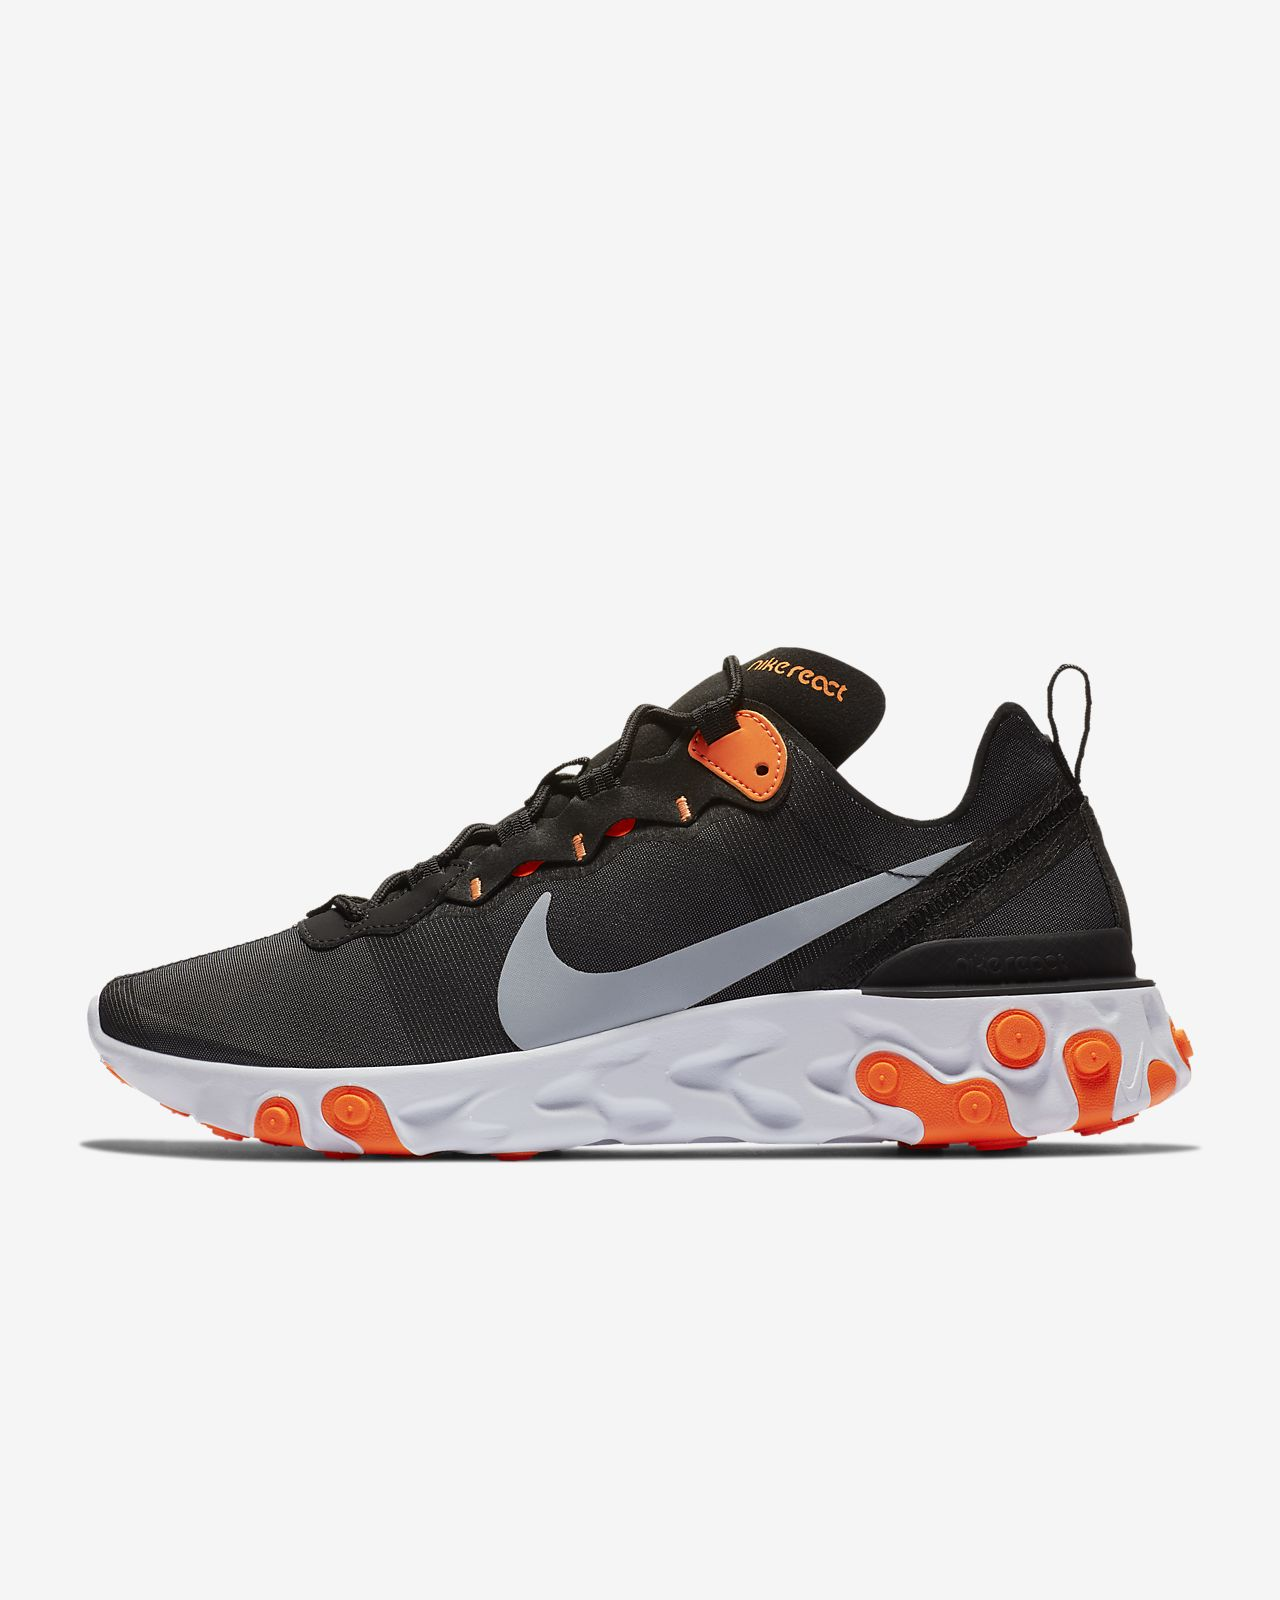 2nike 2019 scarpe